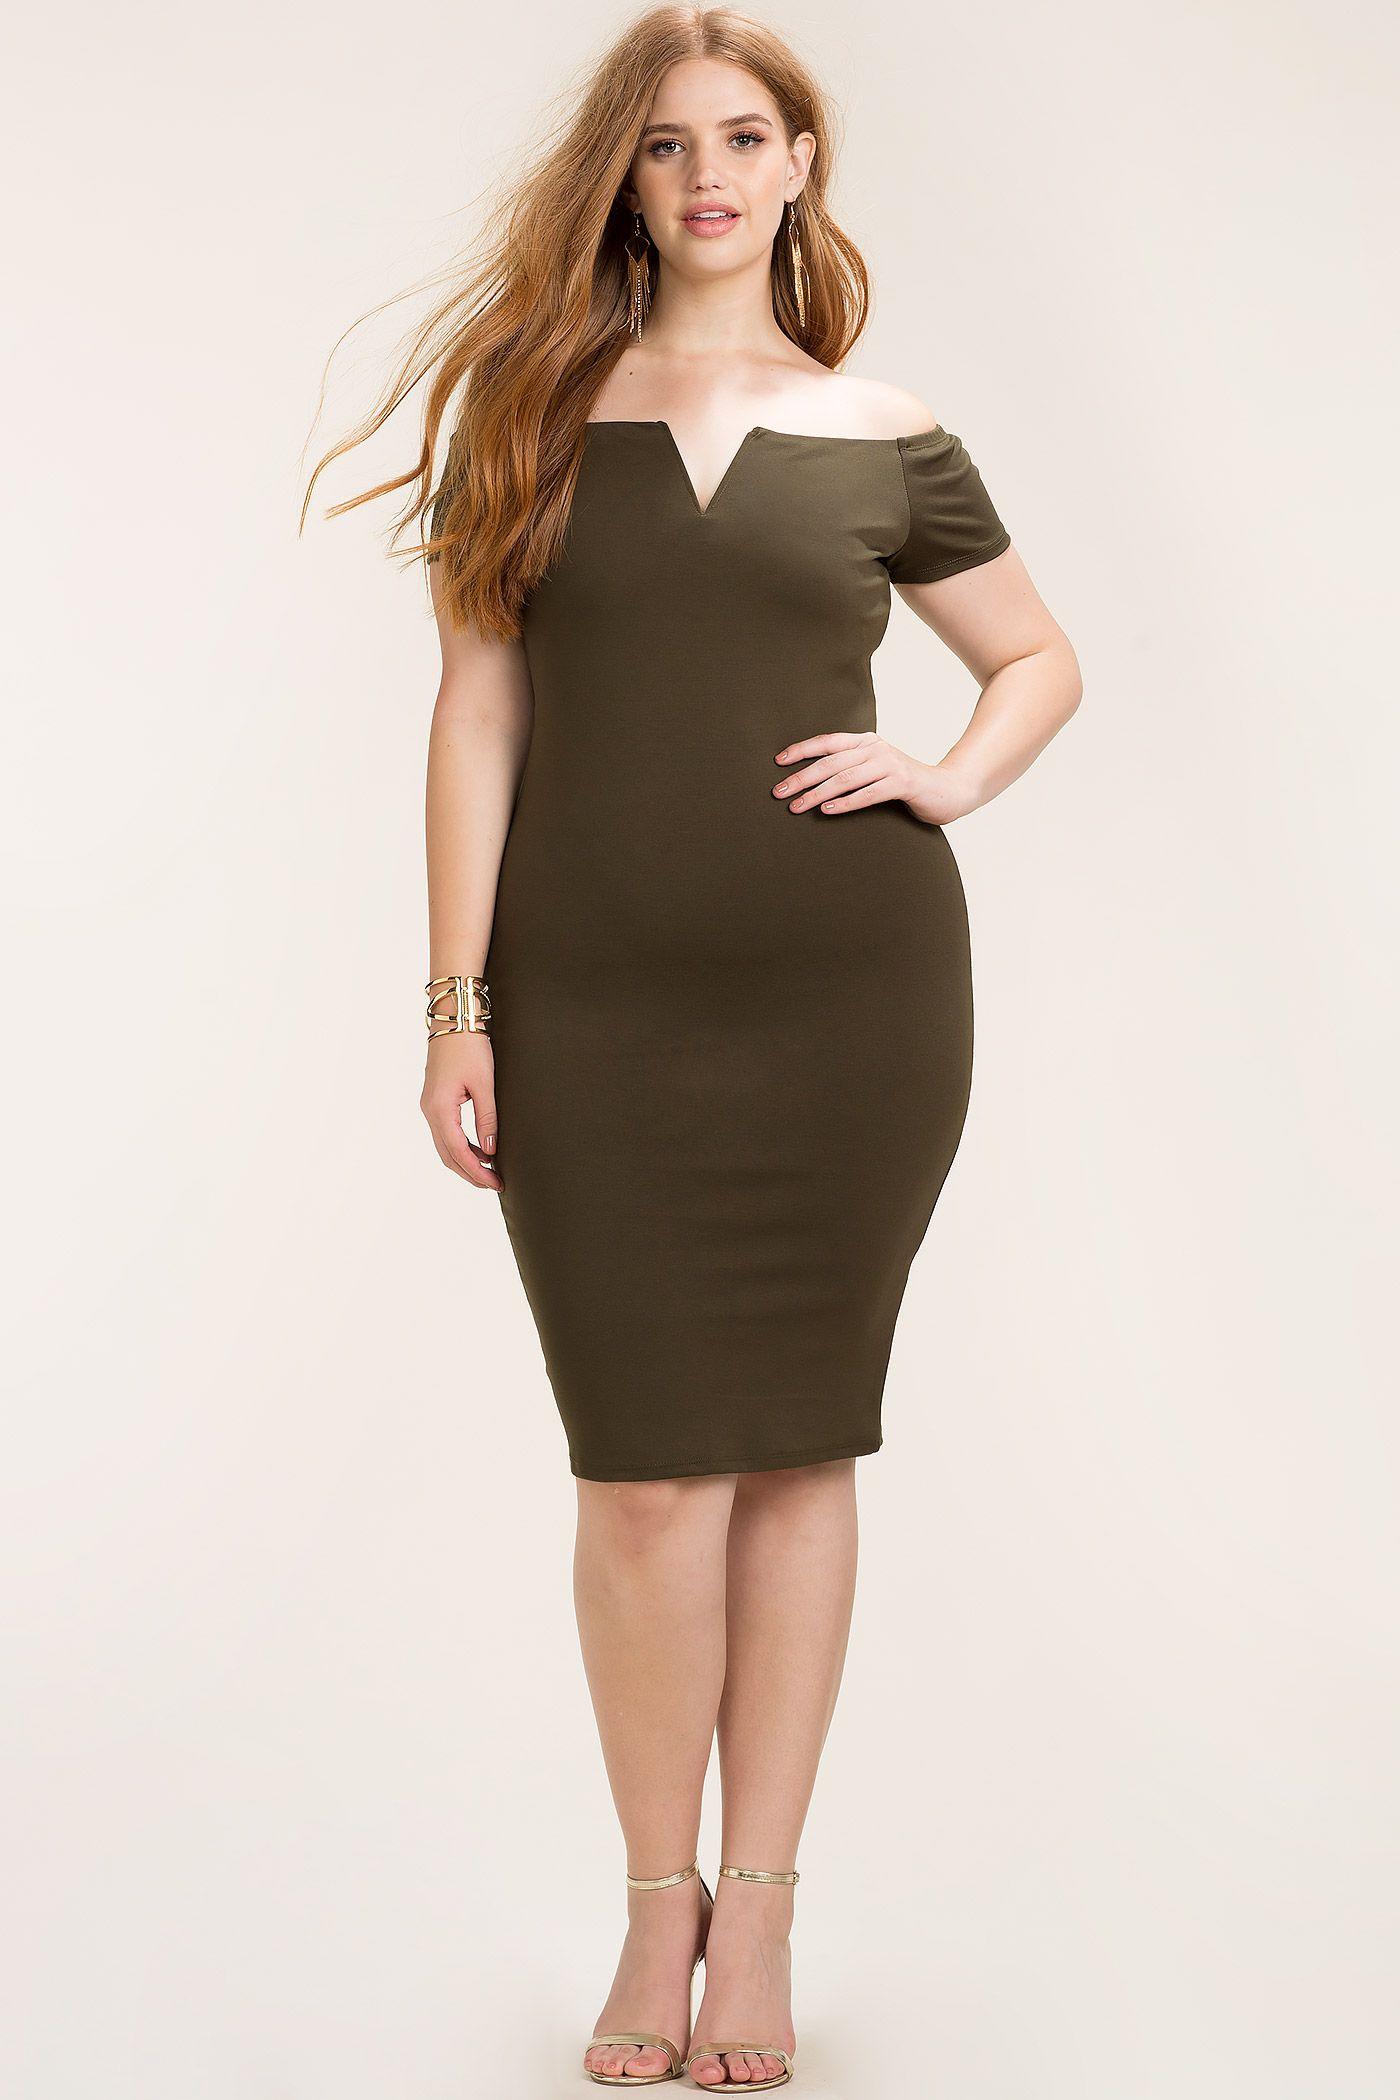 Women\'s Plus Size Bodycon Dresses | Desiree Off Shoulder Bodycon ...